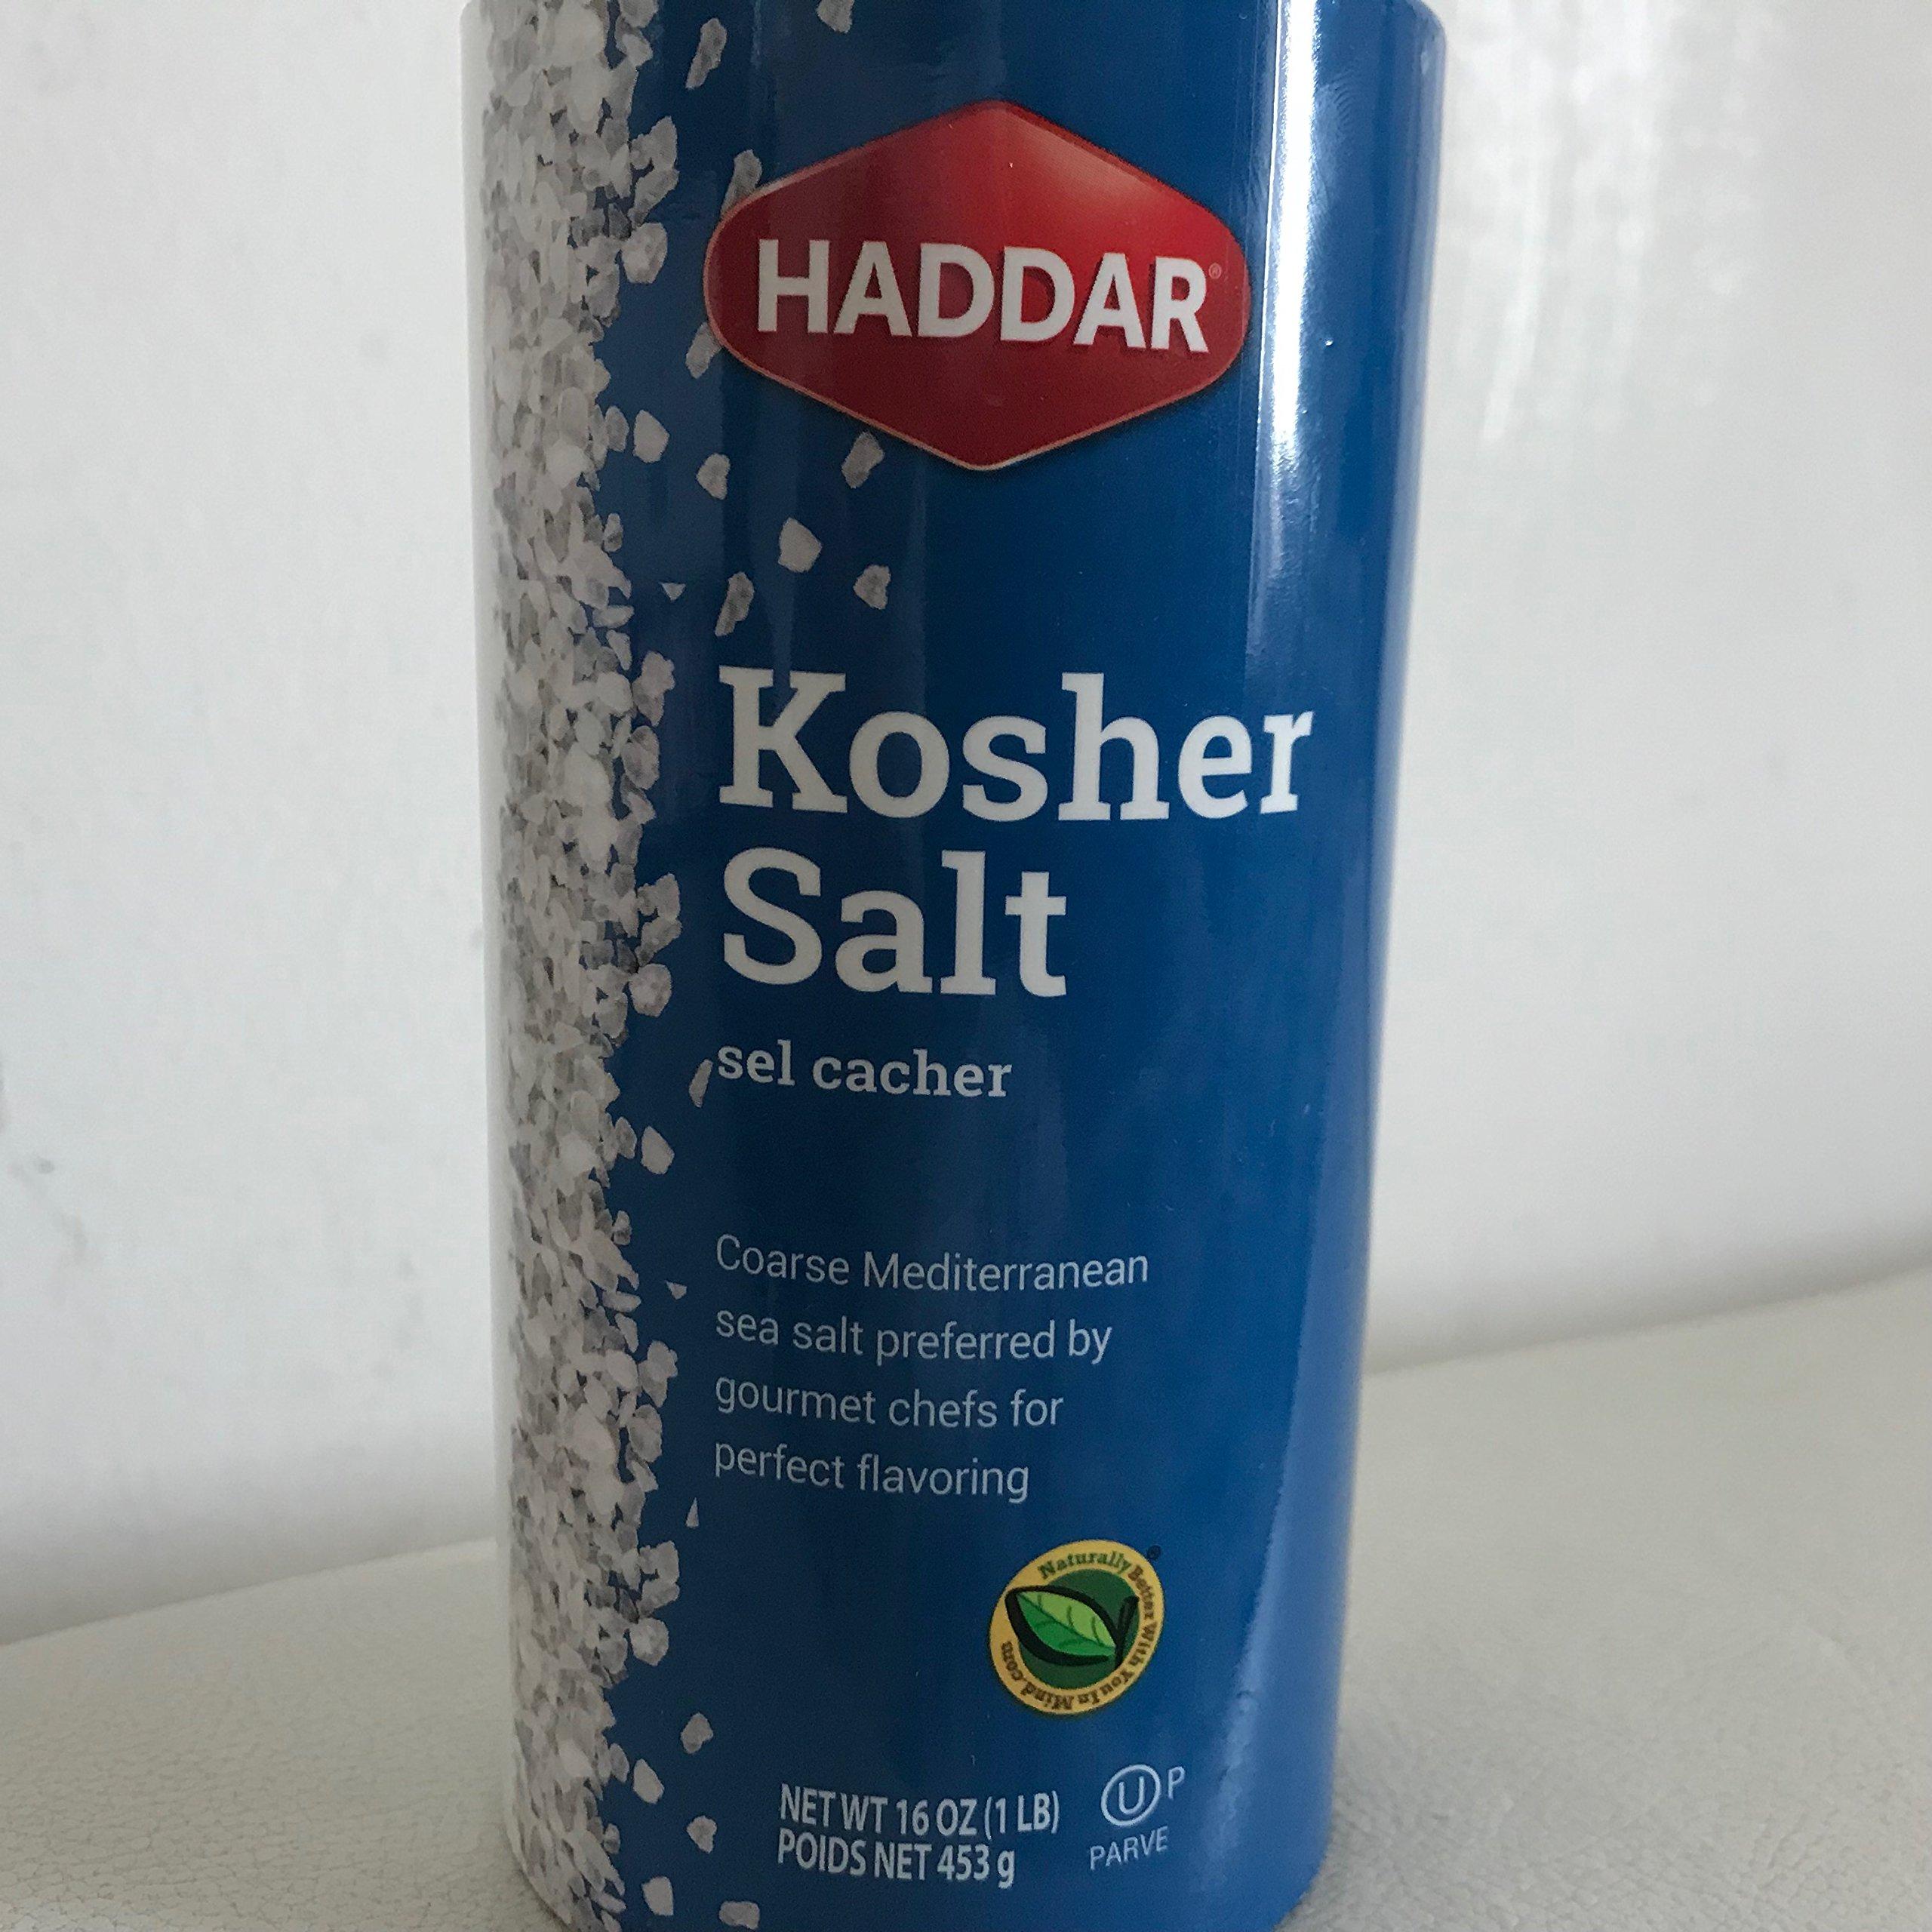 Haddar Kosher Salt 16 oz